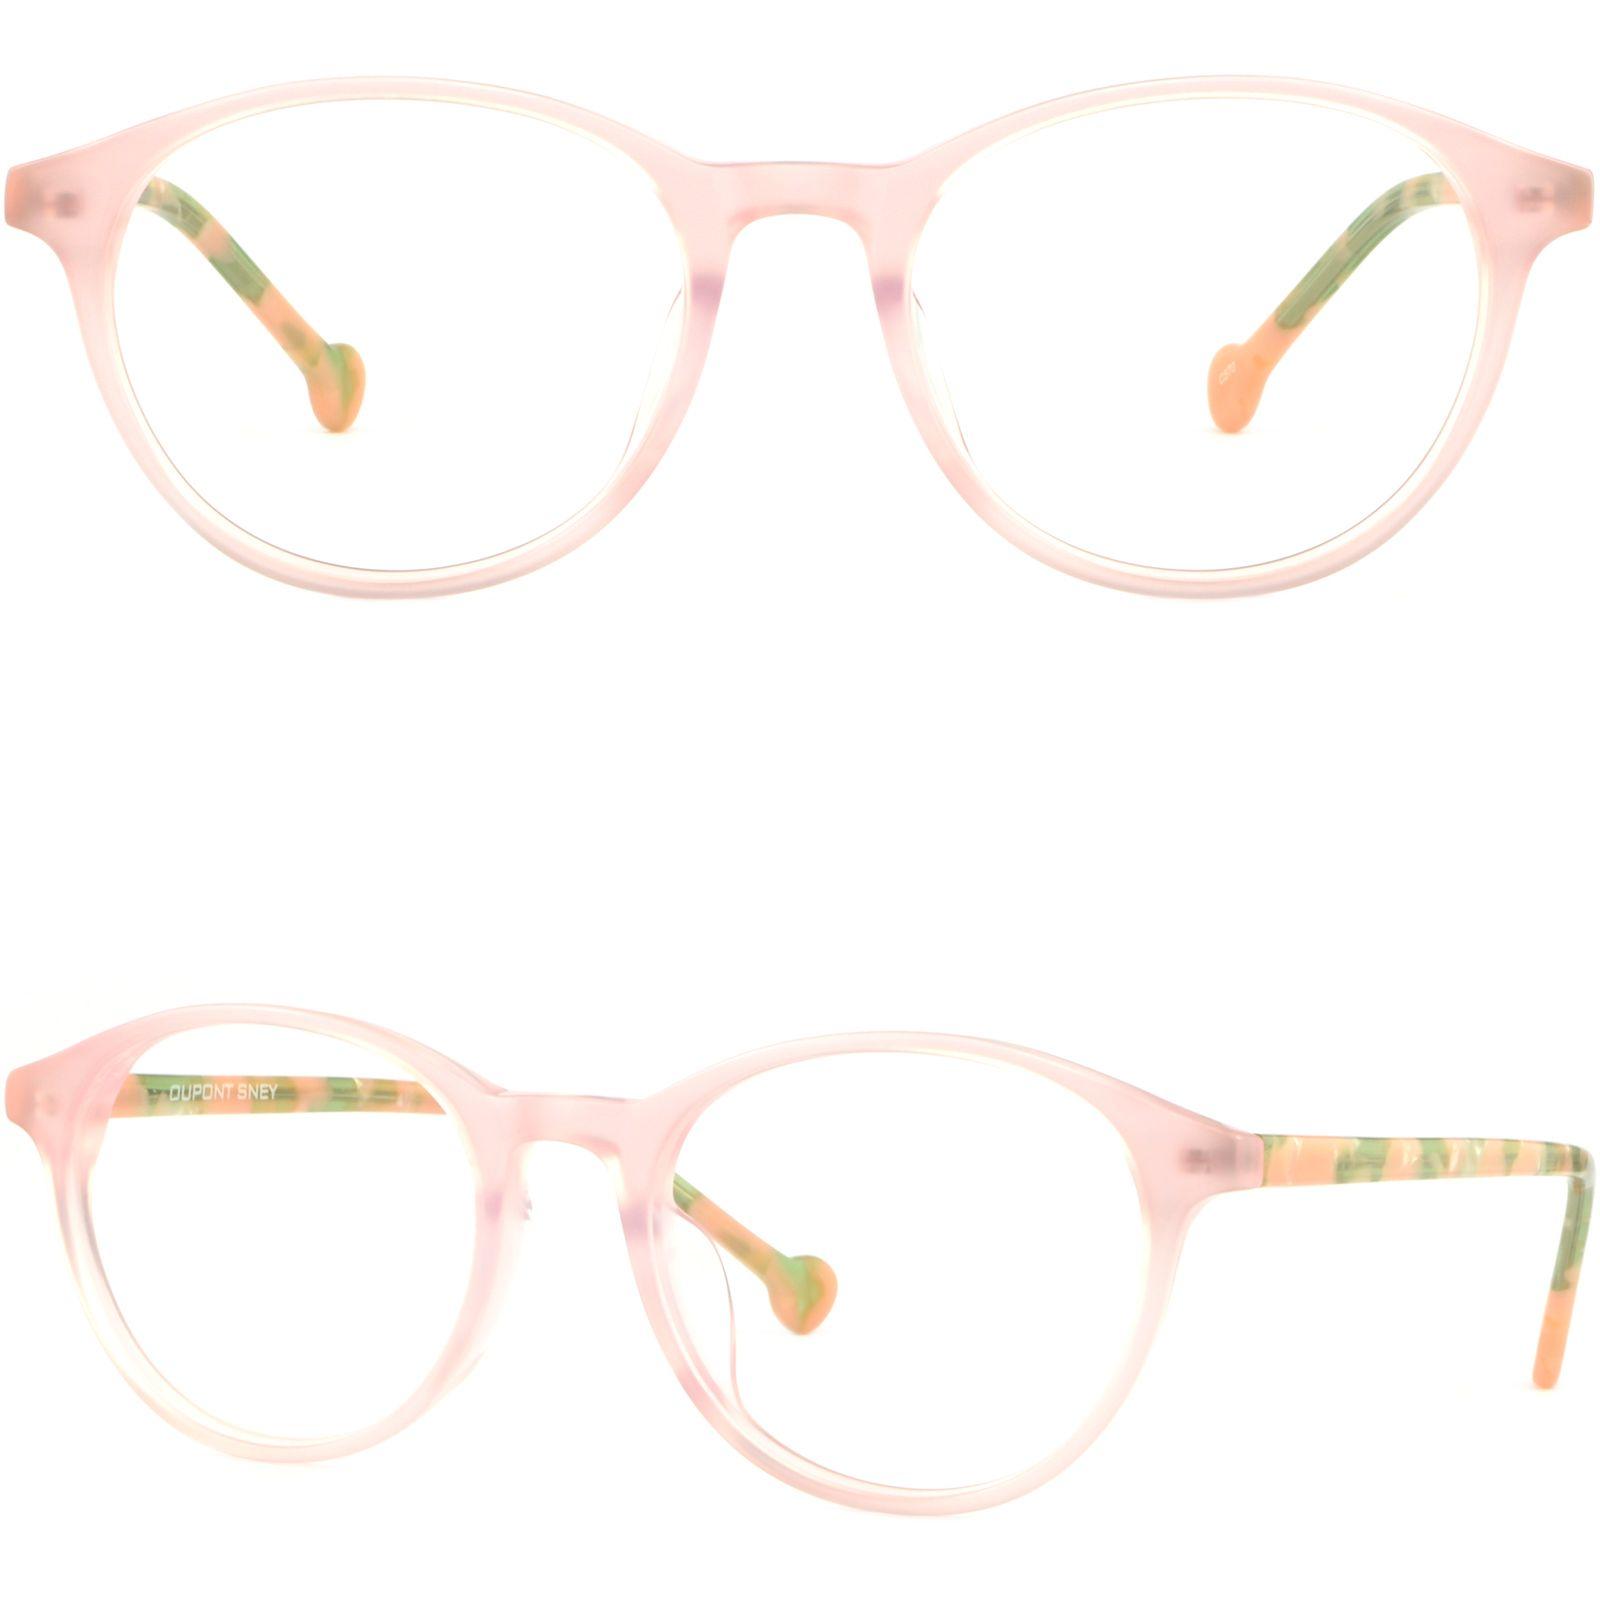 44a202270a Brille Light Womens Plastic Frames Thin Acetate Glasses Pink Brillengestell  Fassung Damenbrille Rund Kawasaki Eyeglasses Frames Lei Eyeglass Frames  From ...